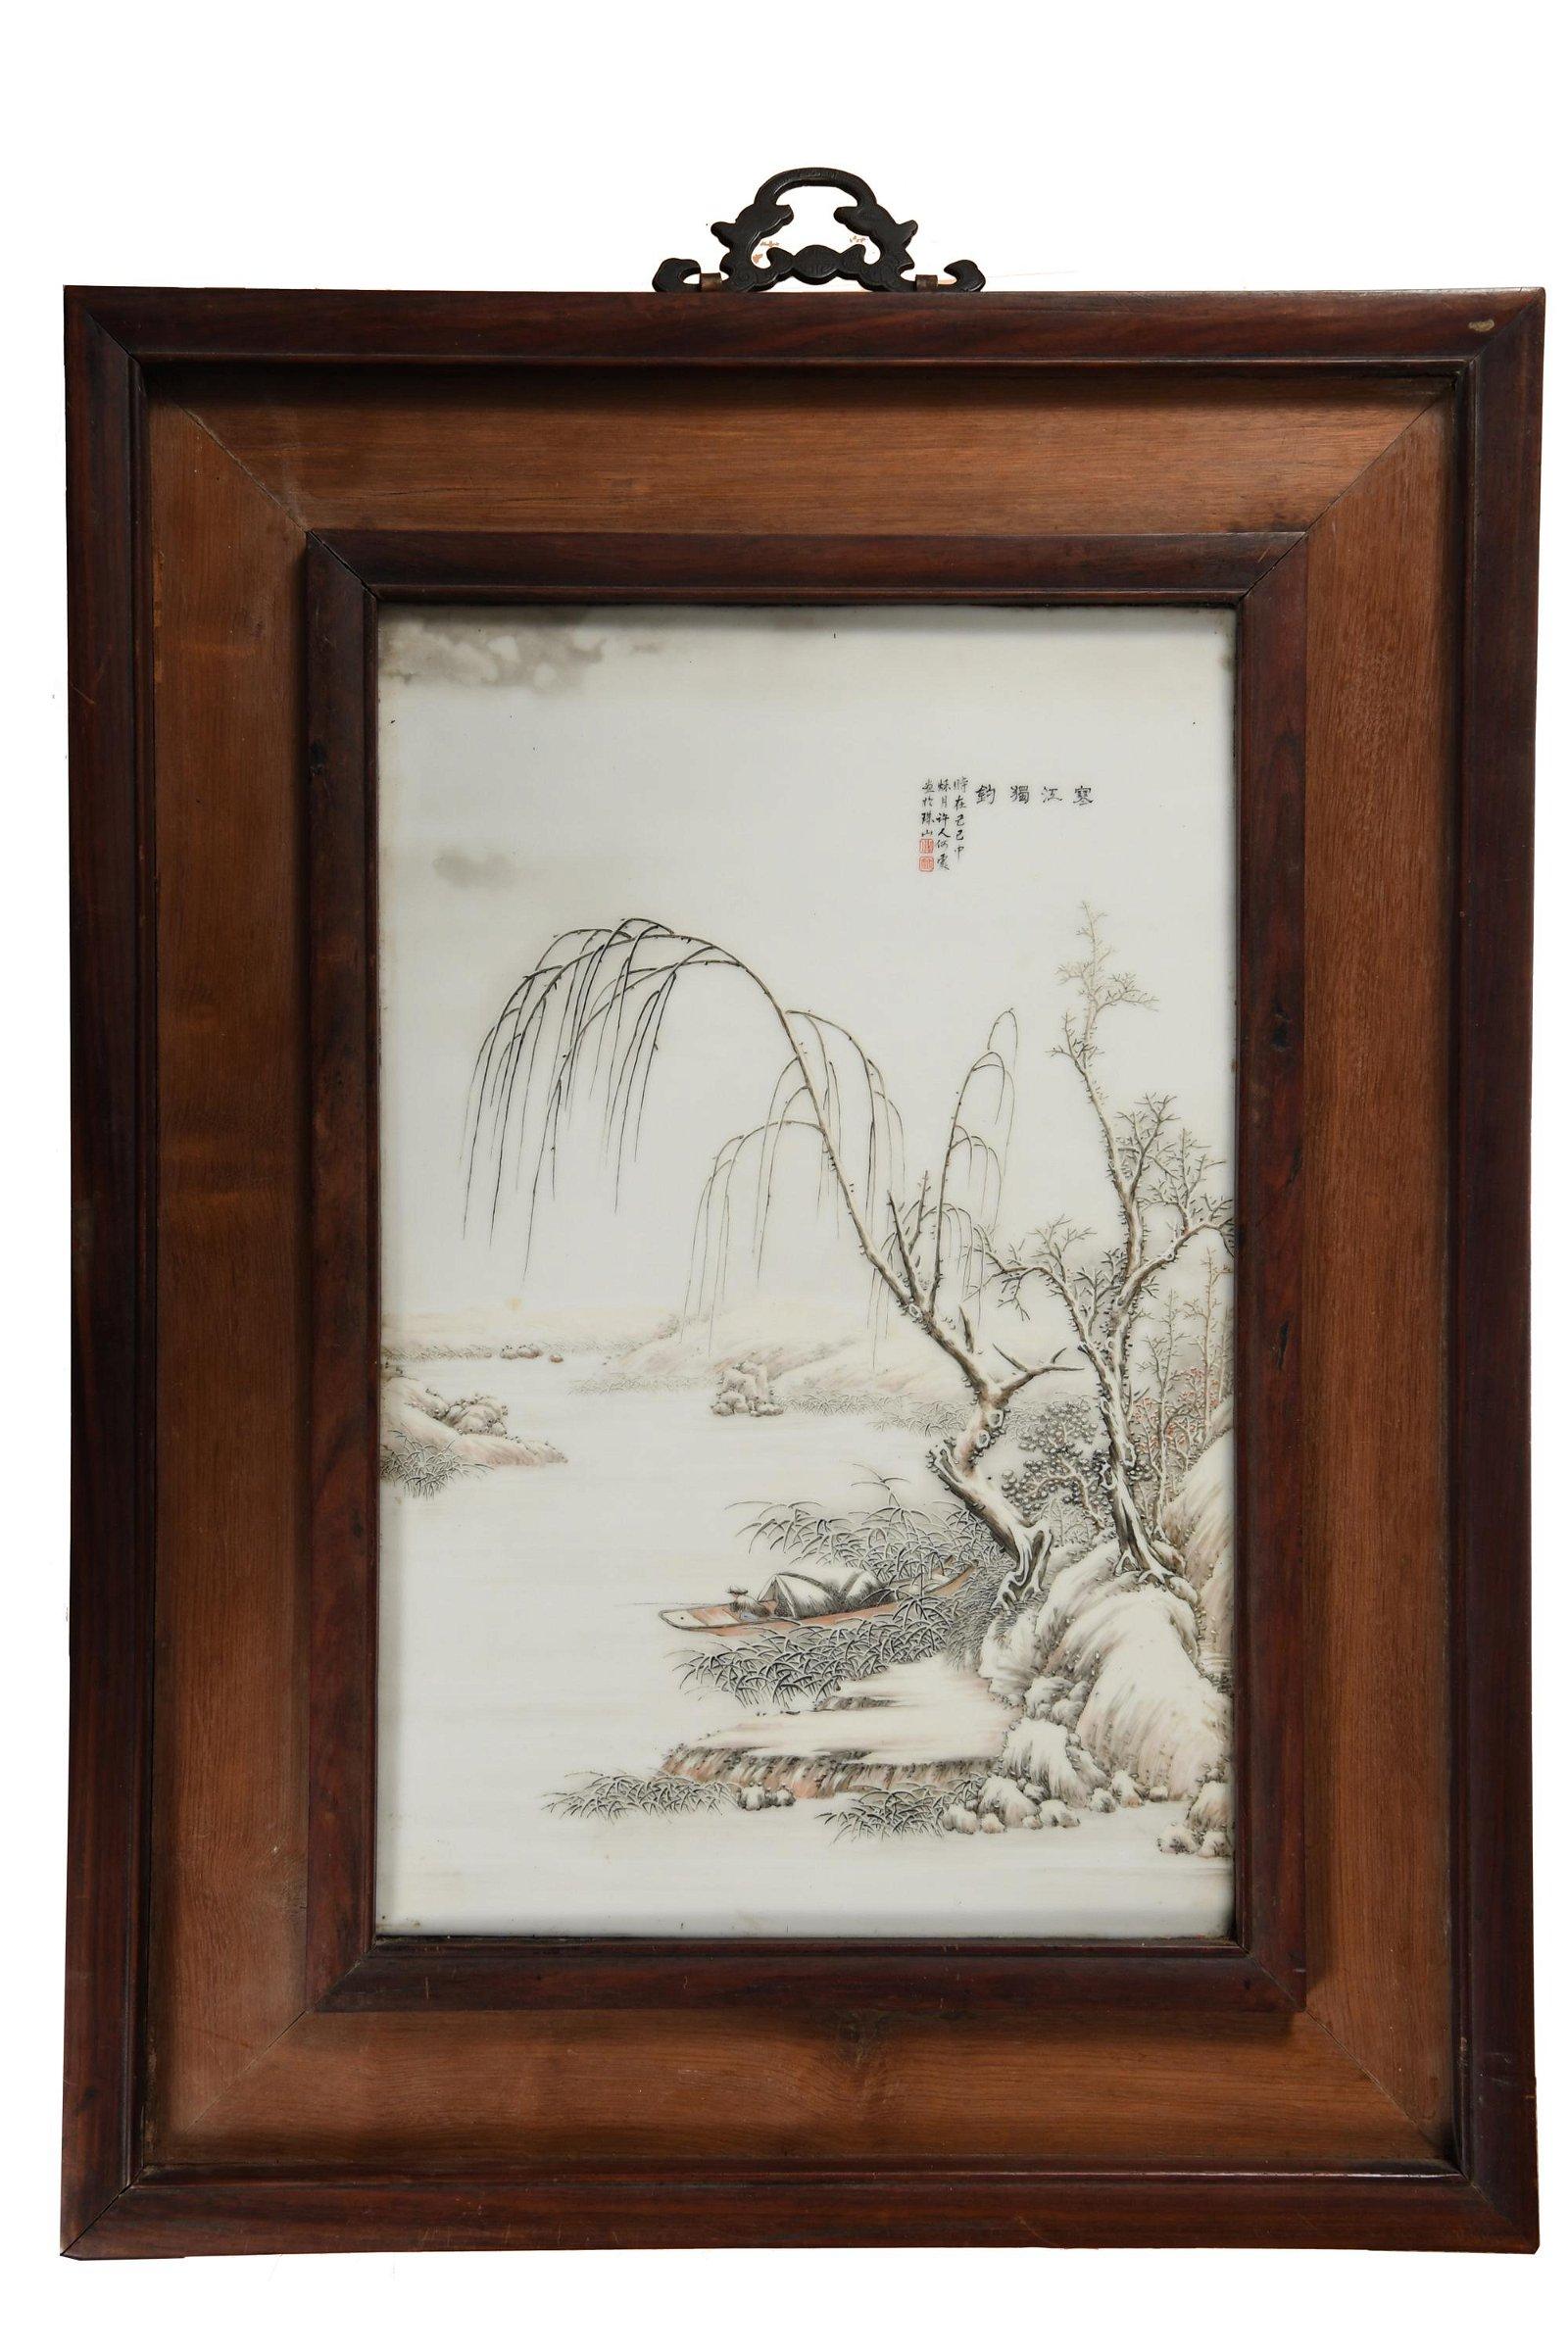 Chinese Plaque of Snowy Scene by He Xuren